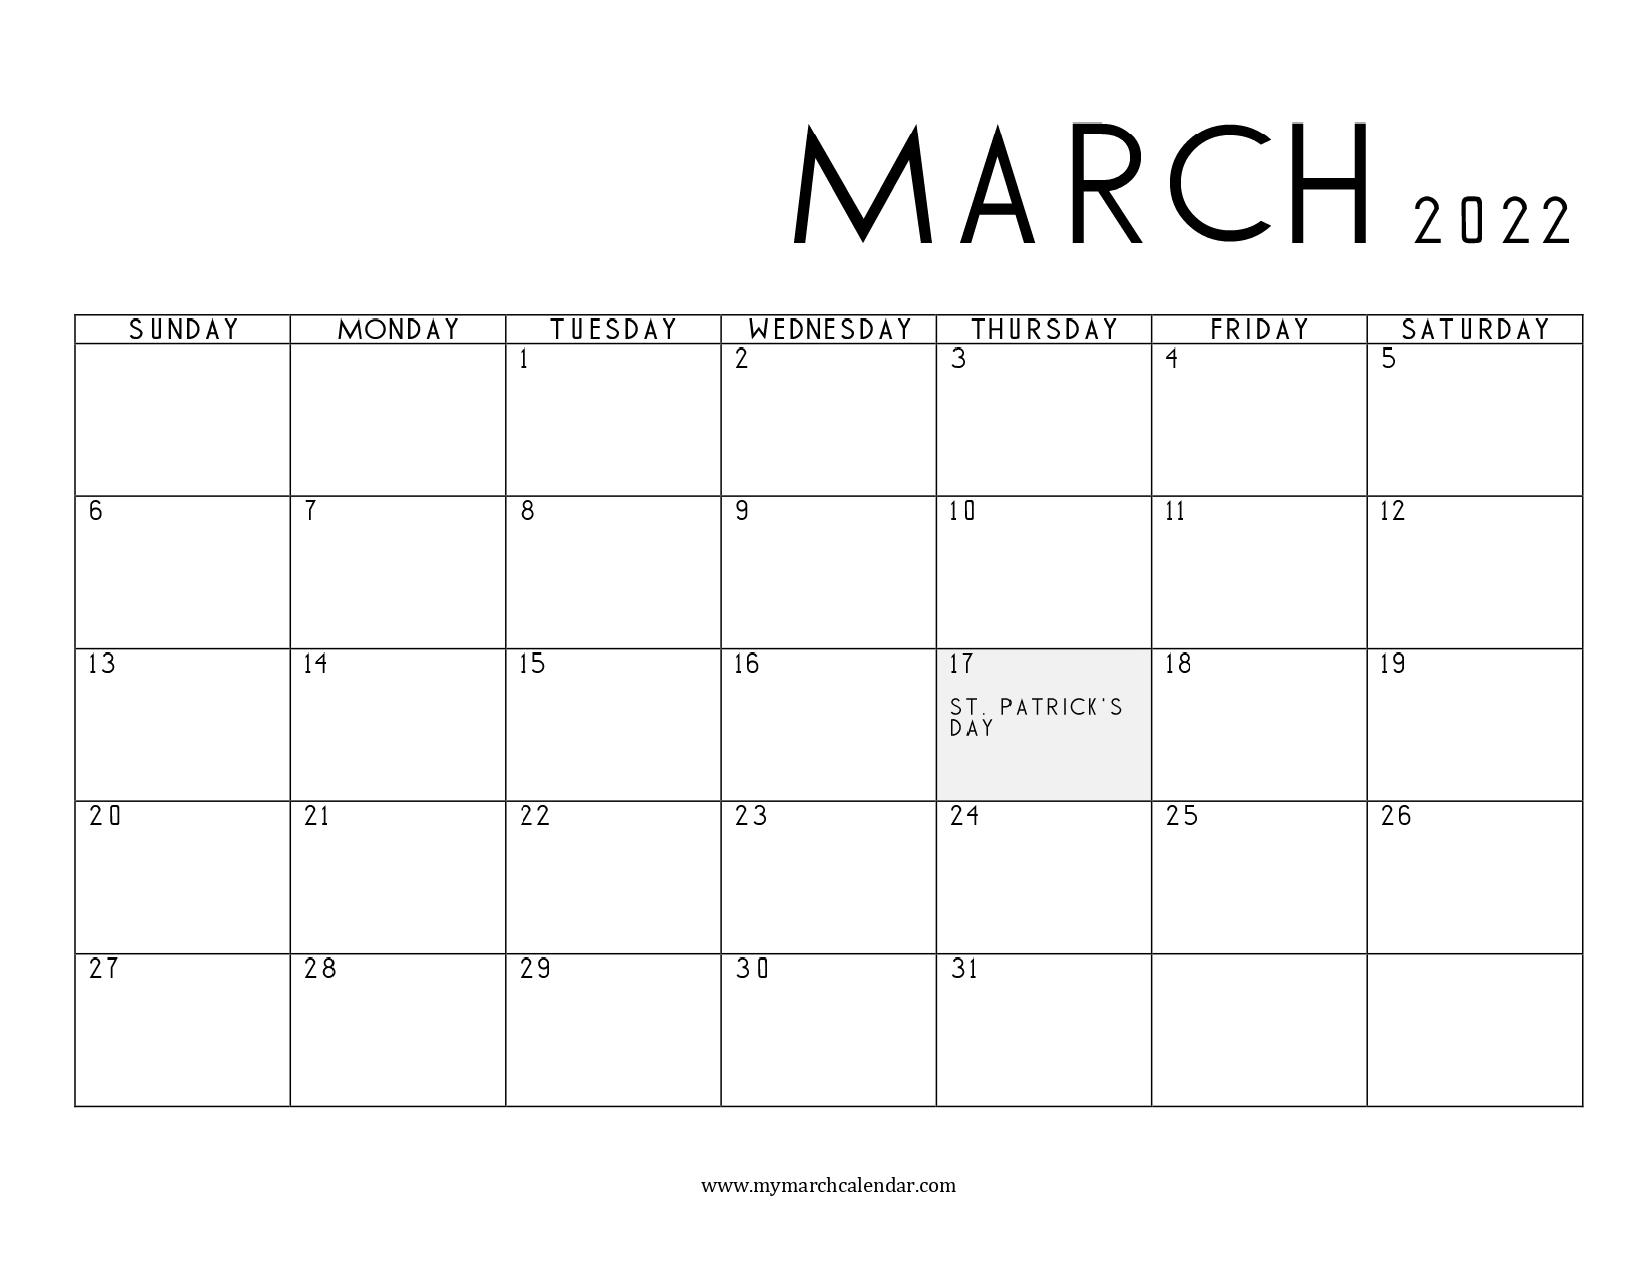 30+ March 2022 Calendar, March 2022 Blank Calendar With Regard To February March Calendar 2022